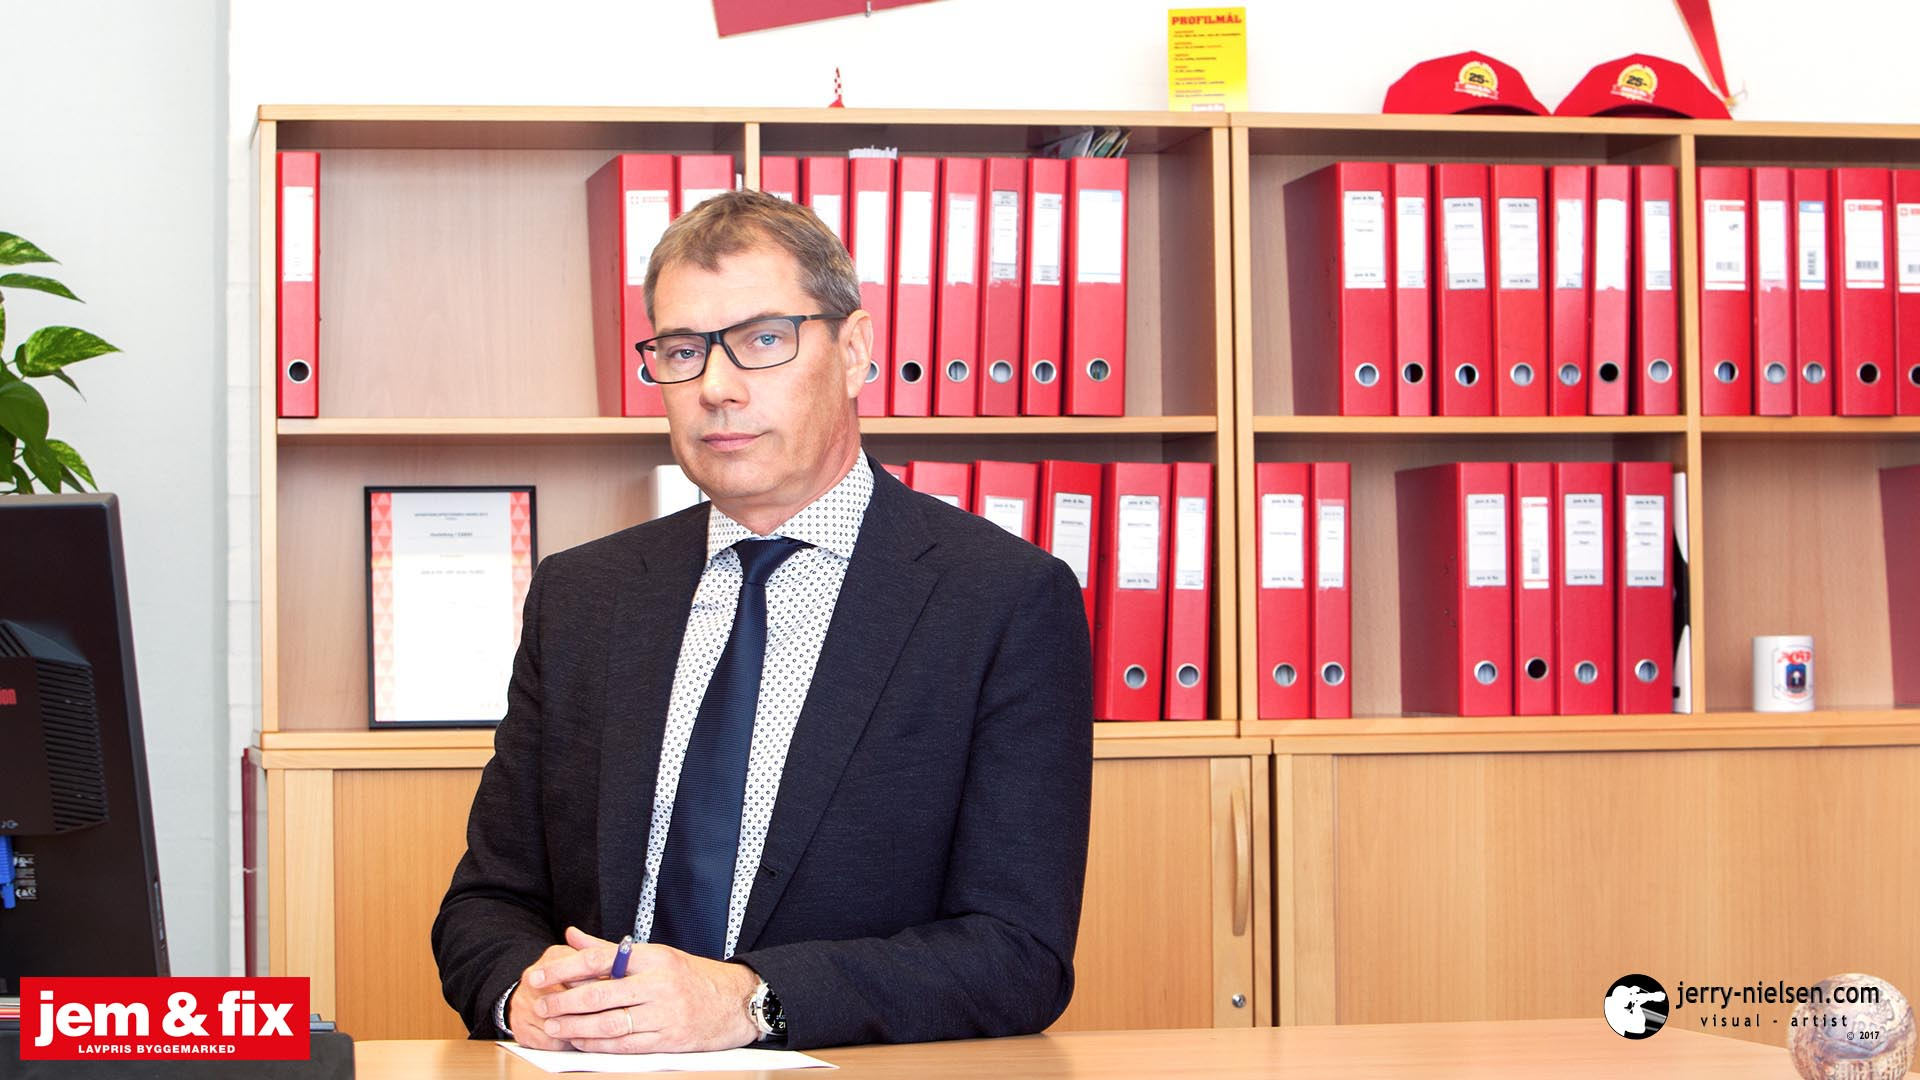 Claus Petersen, Director of Sales at jem & fix